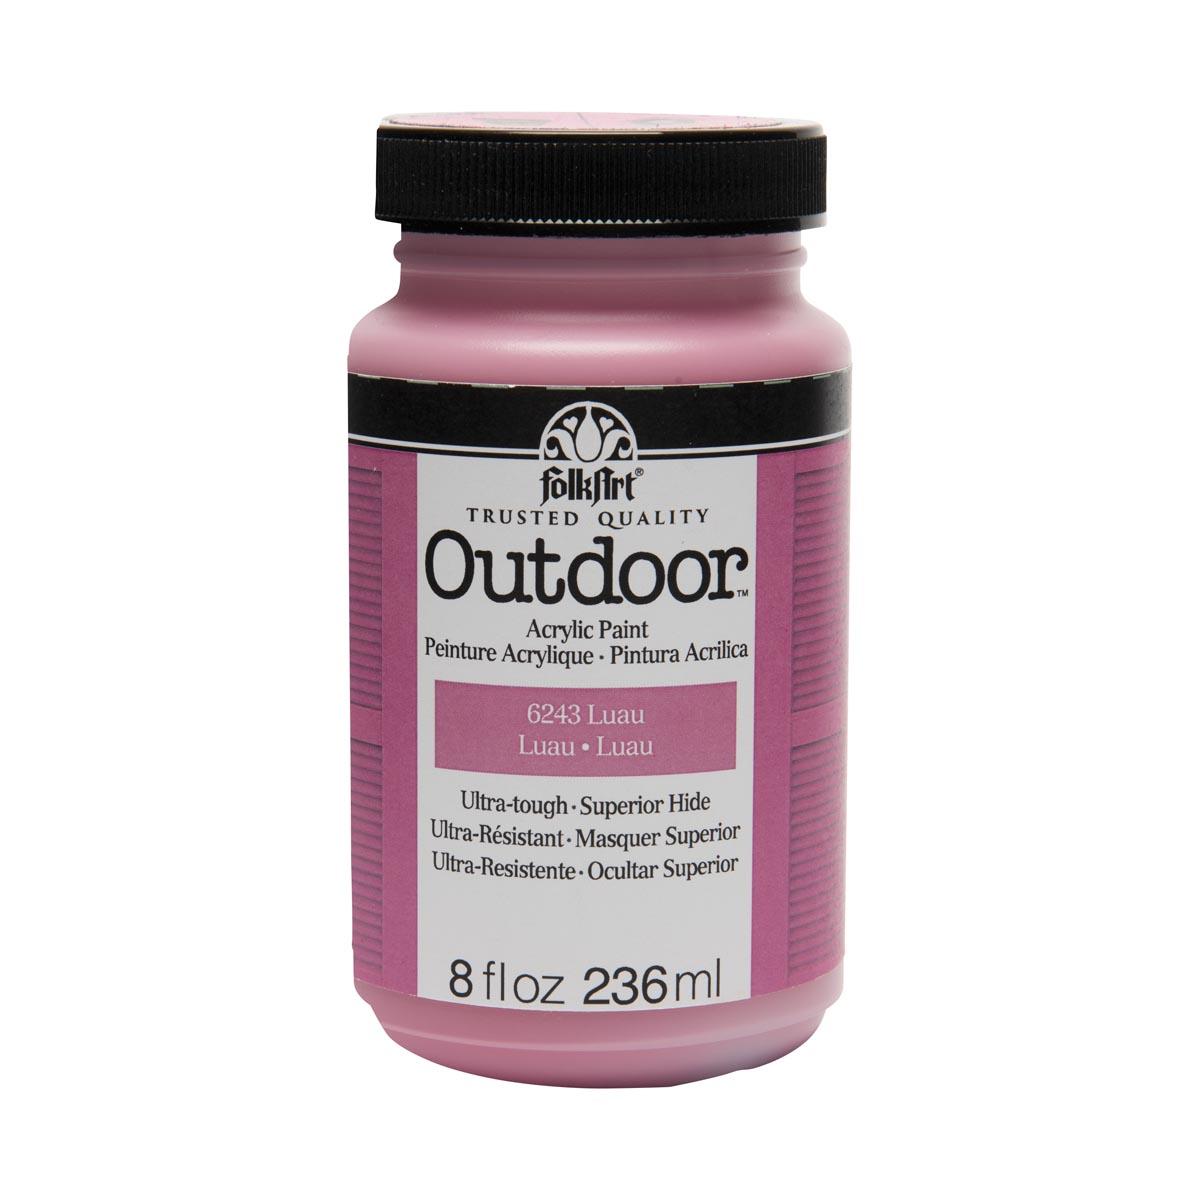 FolkArt ® Outdoor™ Acrylic Colors - Luau, 8 oz.